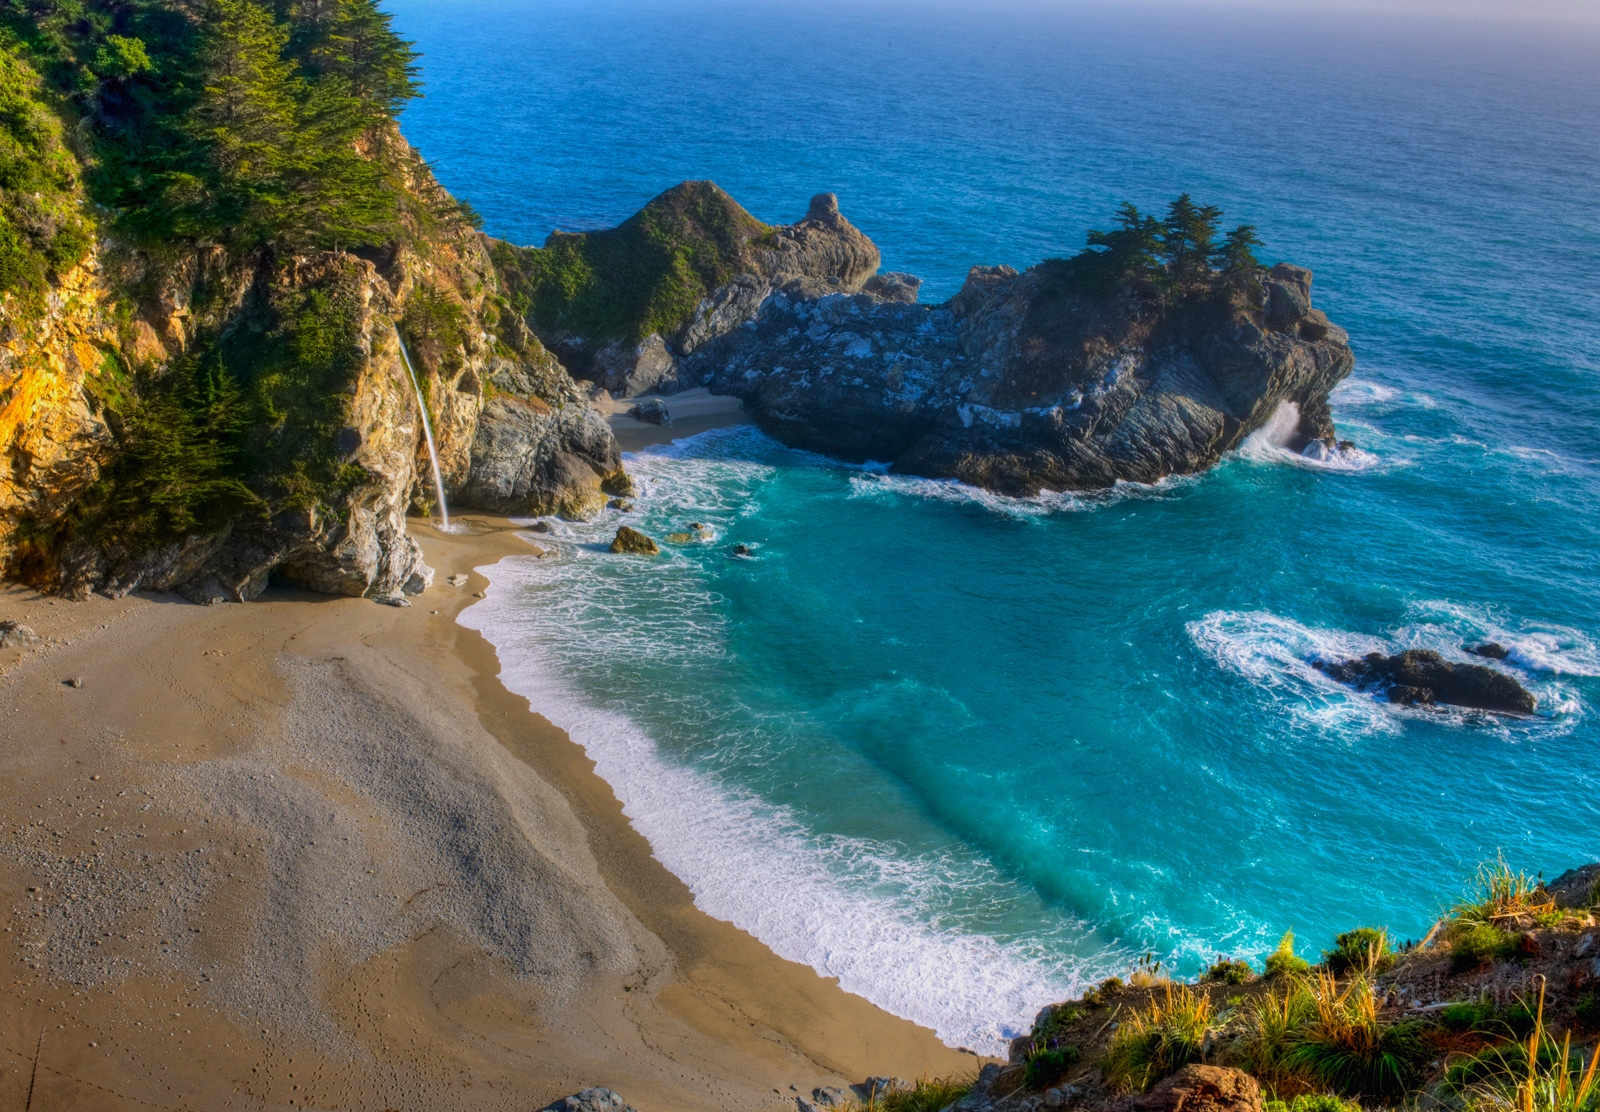 bay, blue, highway !, lagoon, ocean, pacific, surf, waterfall, waterfall on beach, waves, photo